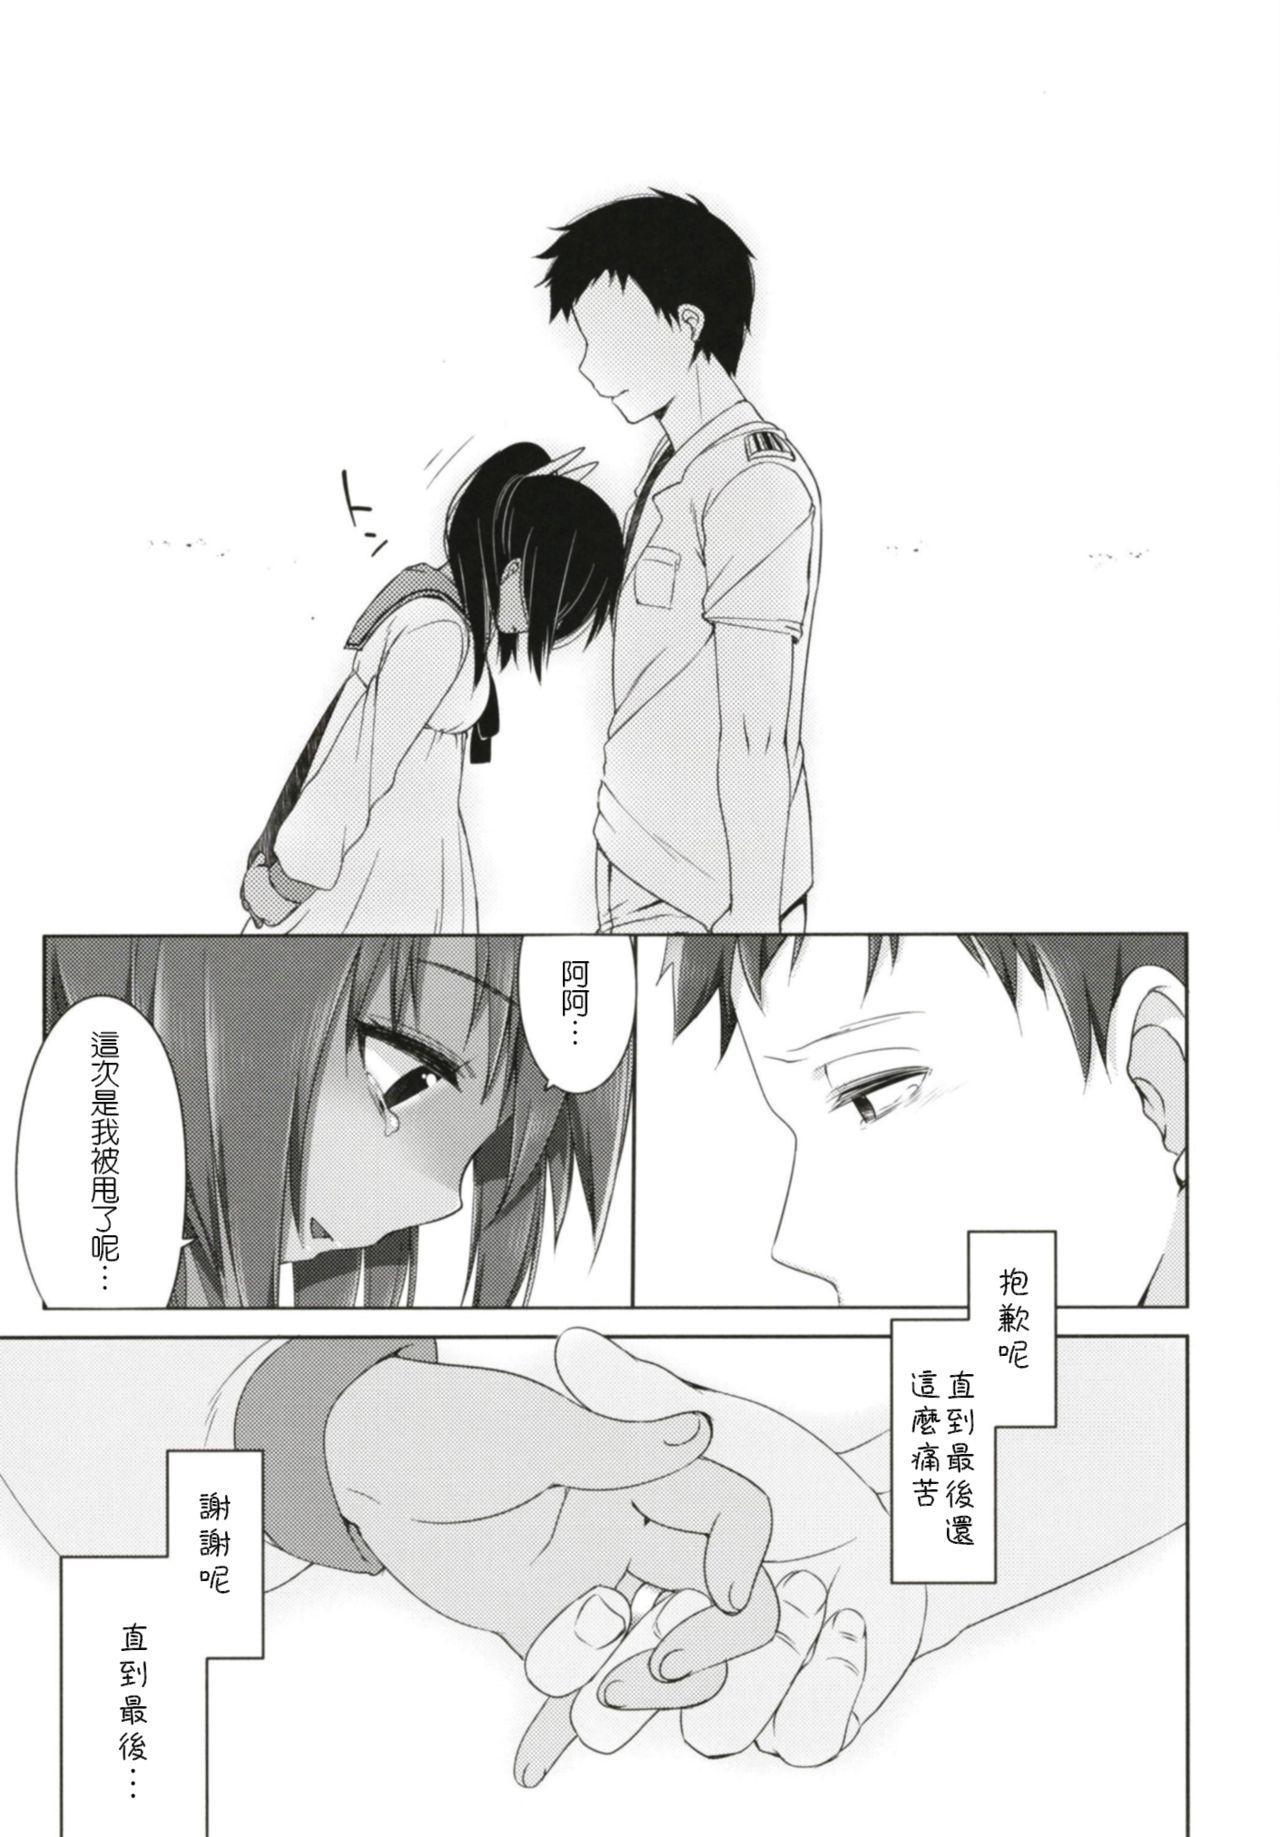 [French letter (Fujisaki Hikari)] Hitonatsu no Ayamachi -I-401 Soushuuhen- (Kantai Collection -KanColle-) [Chinese] [Digital] 84